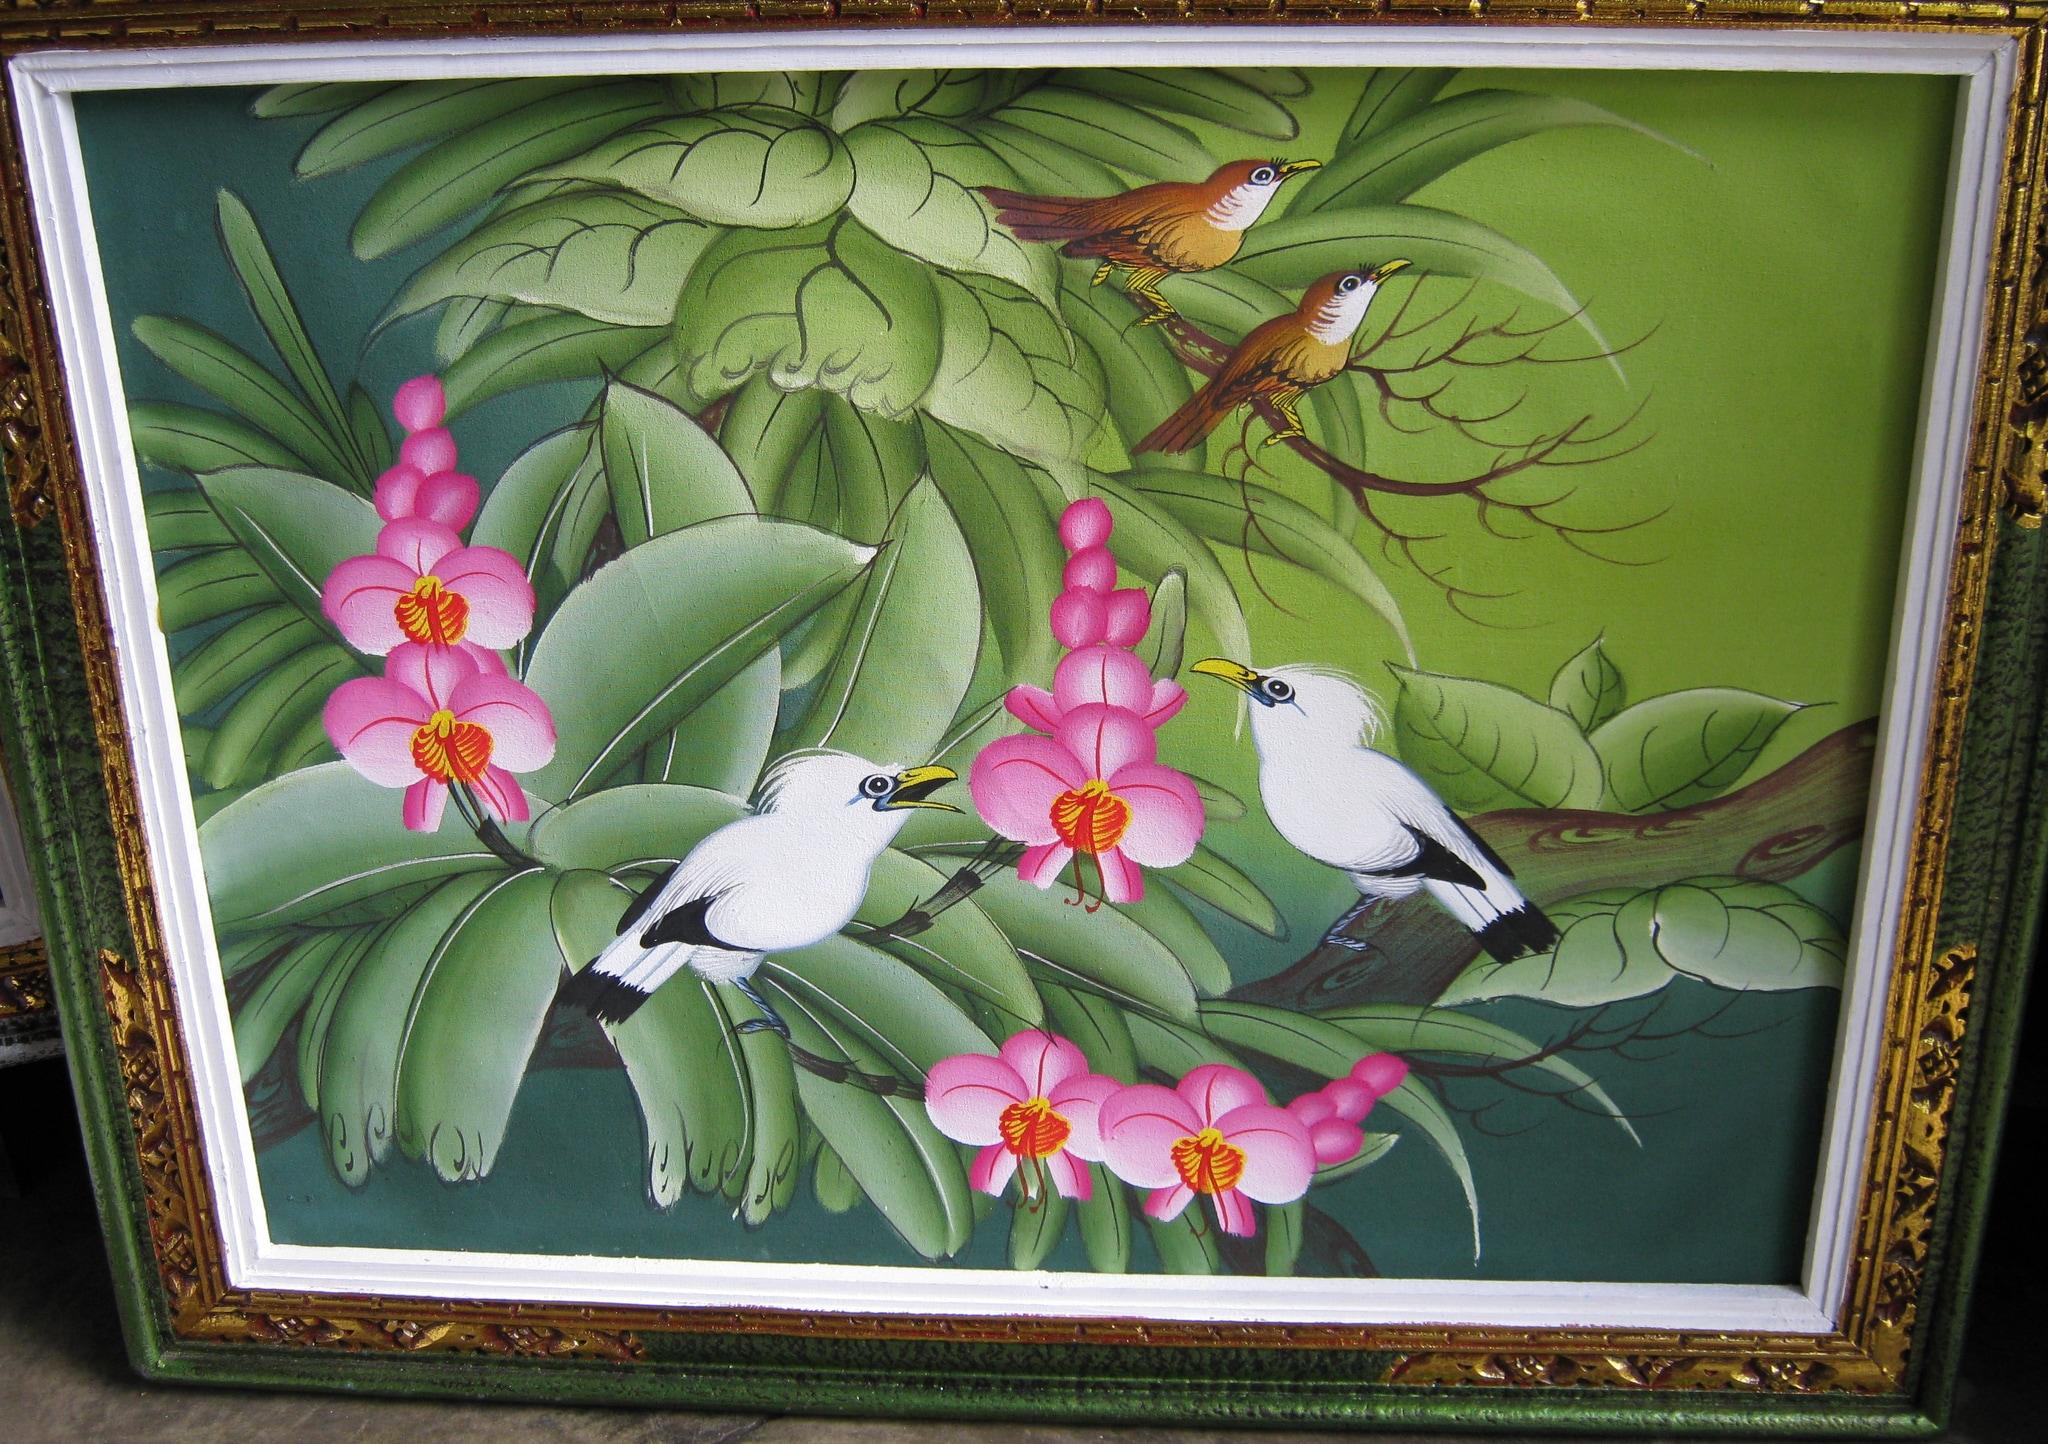 Jual Lukisan Burung Jalak Bali Background Hijau Bagus Art Tokopedia